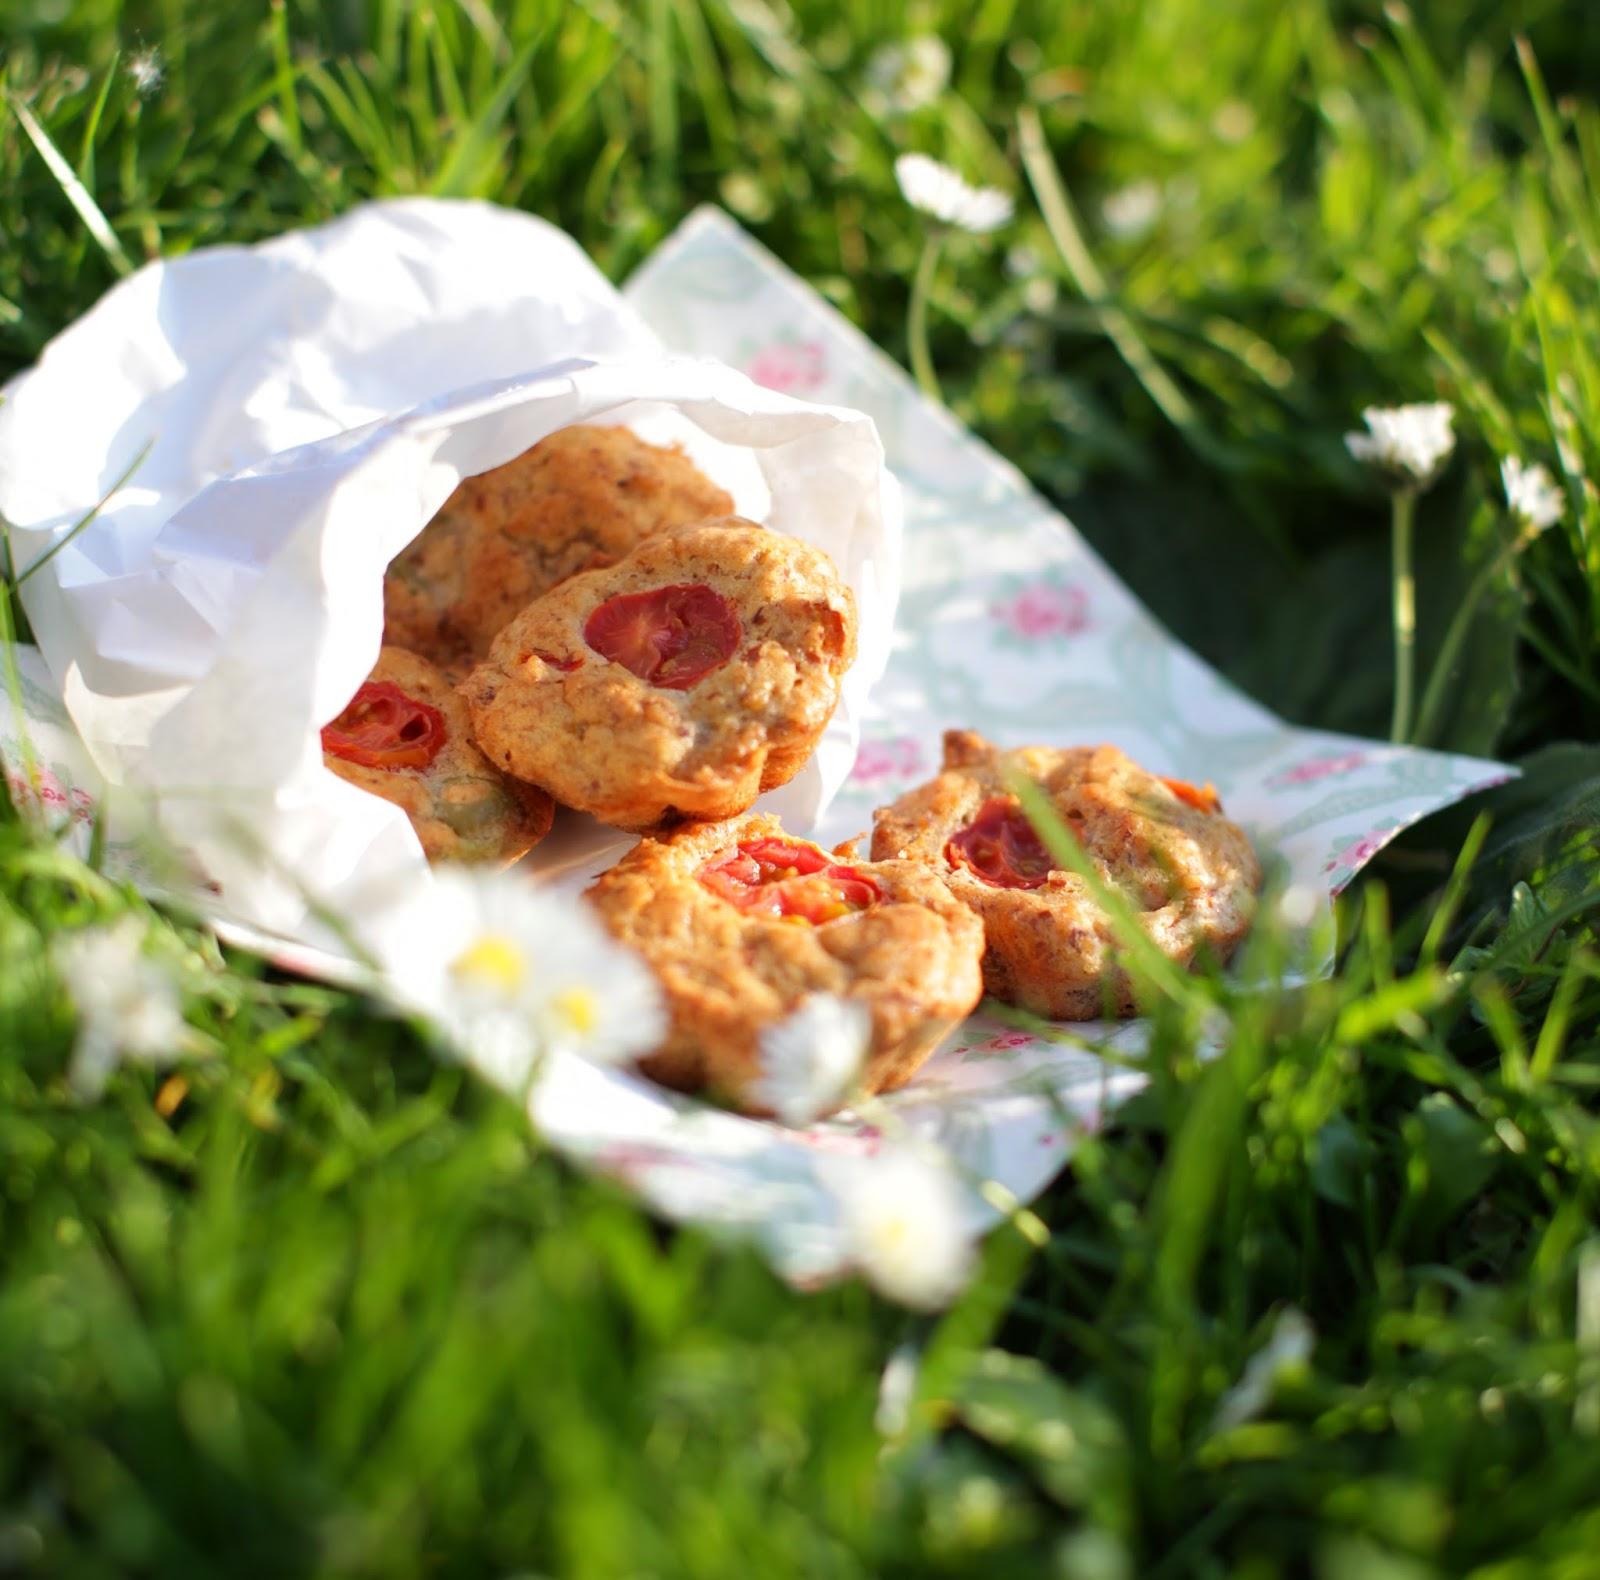 http://our-favorite-apple-pie.blogspot.com/2014/07/wytrawne-babeczki.html